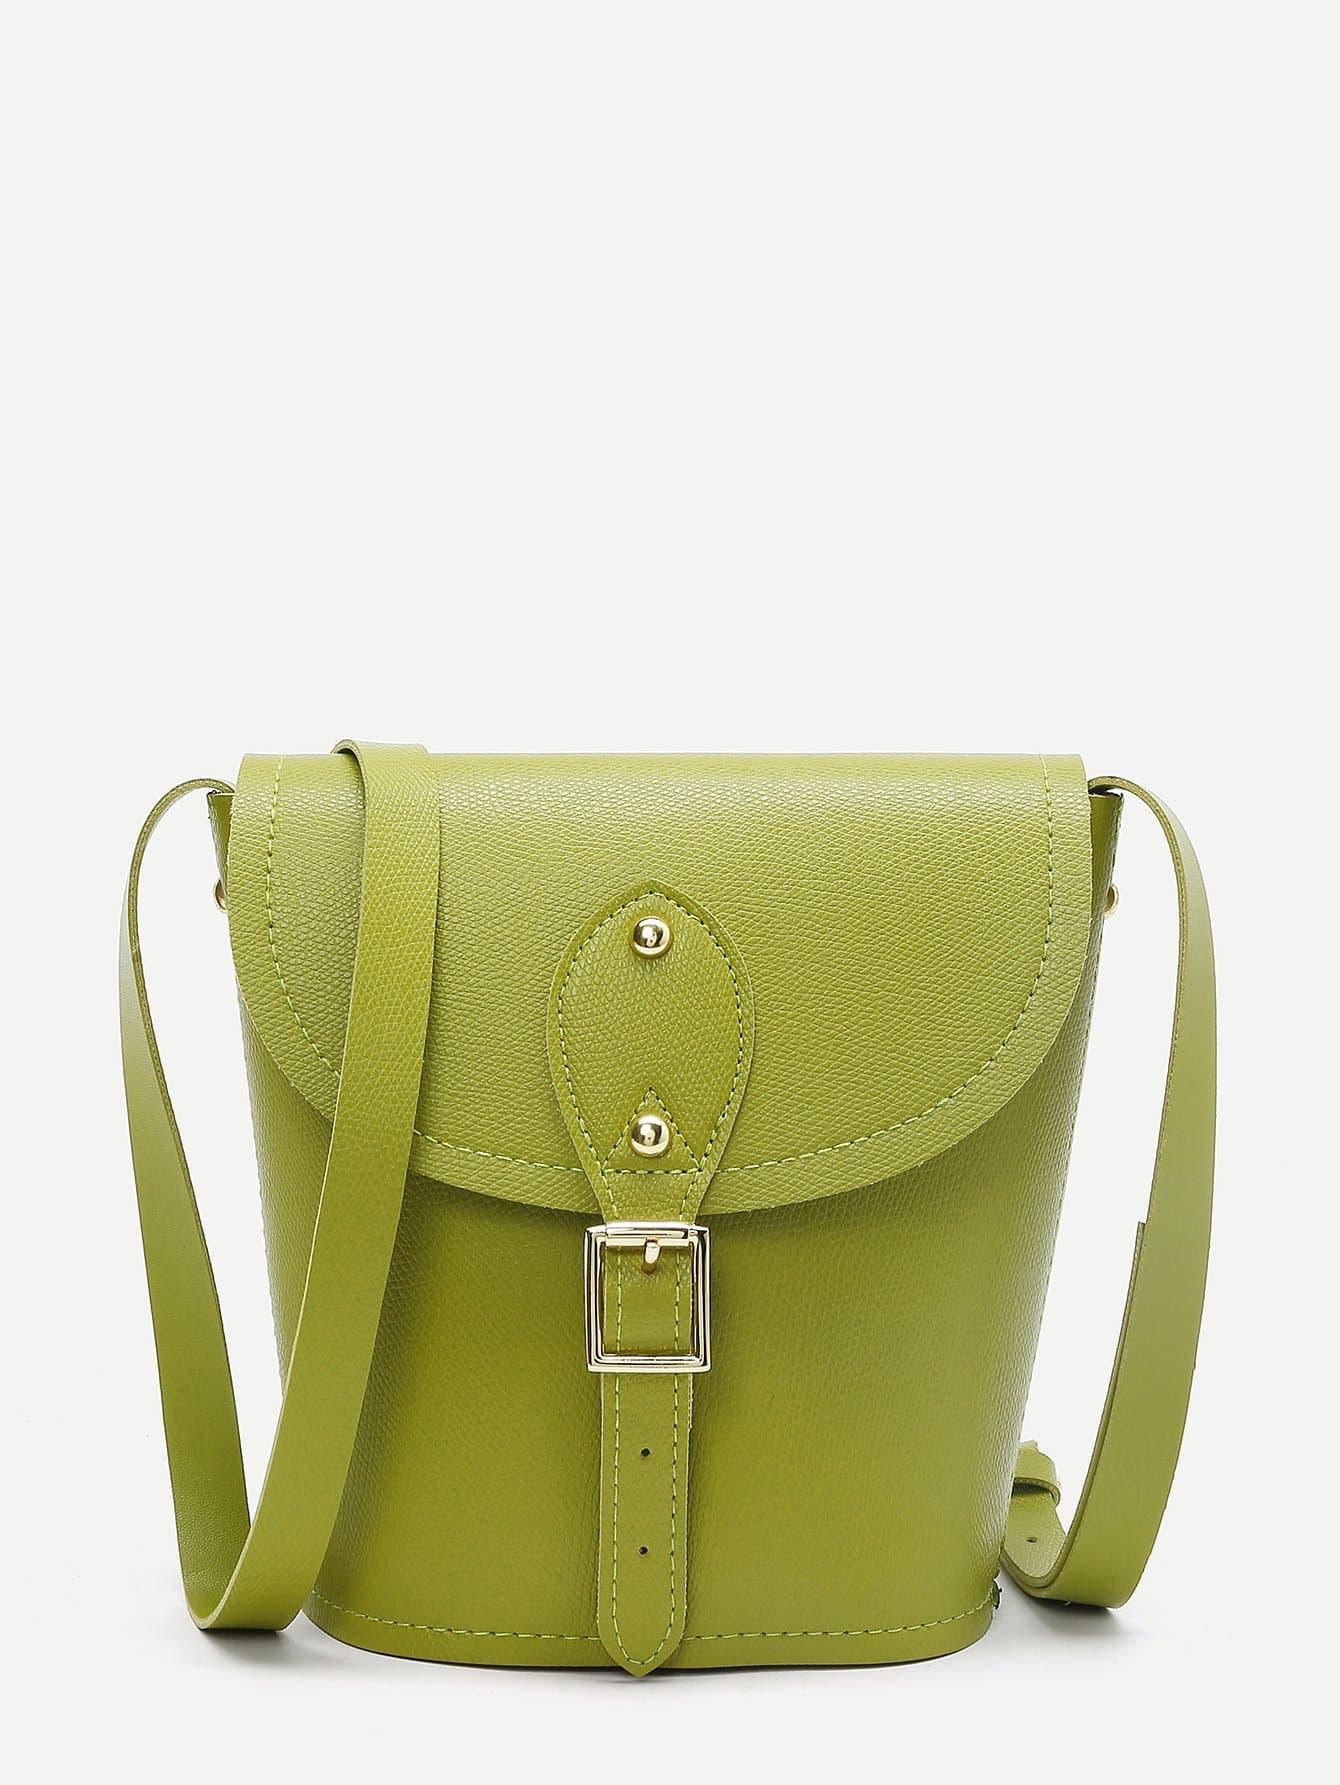 Buckle Detail Flap Crossbody Bag buckle detail flap grab bag